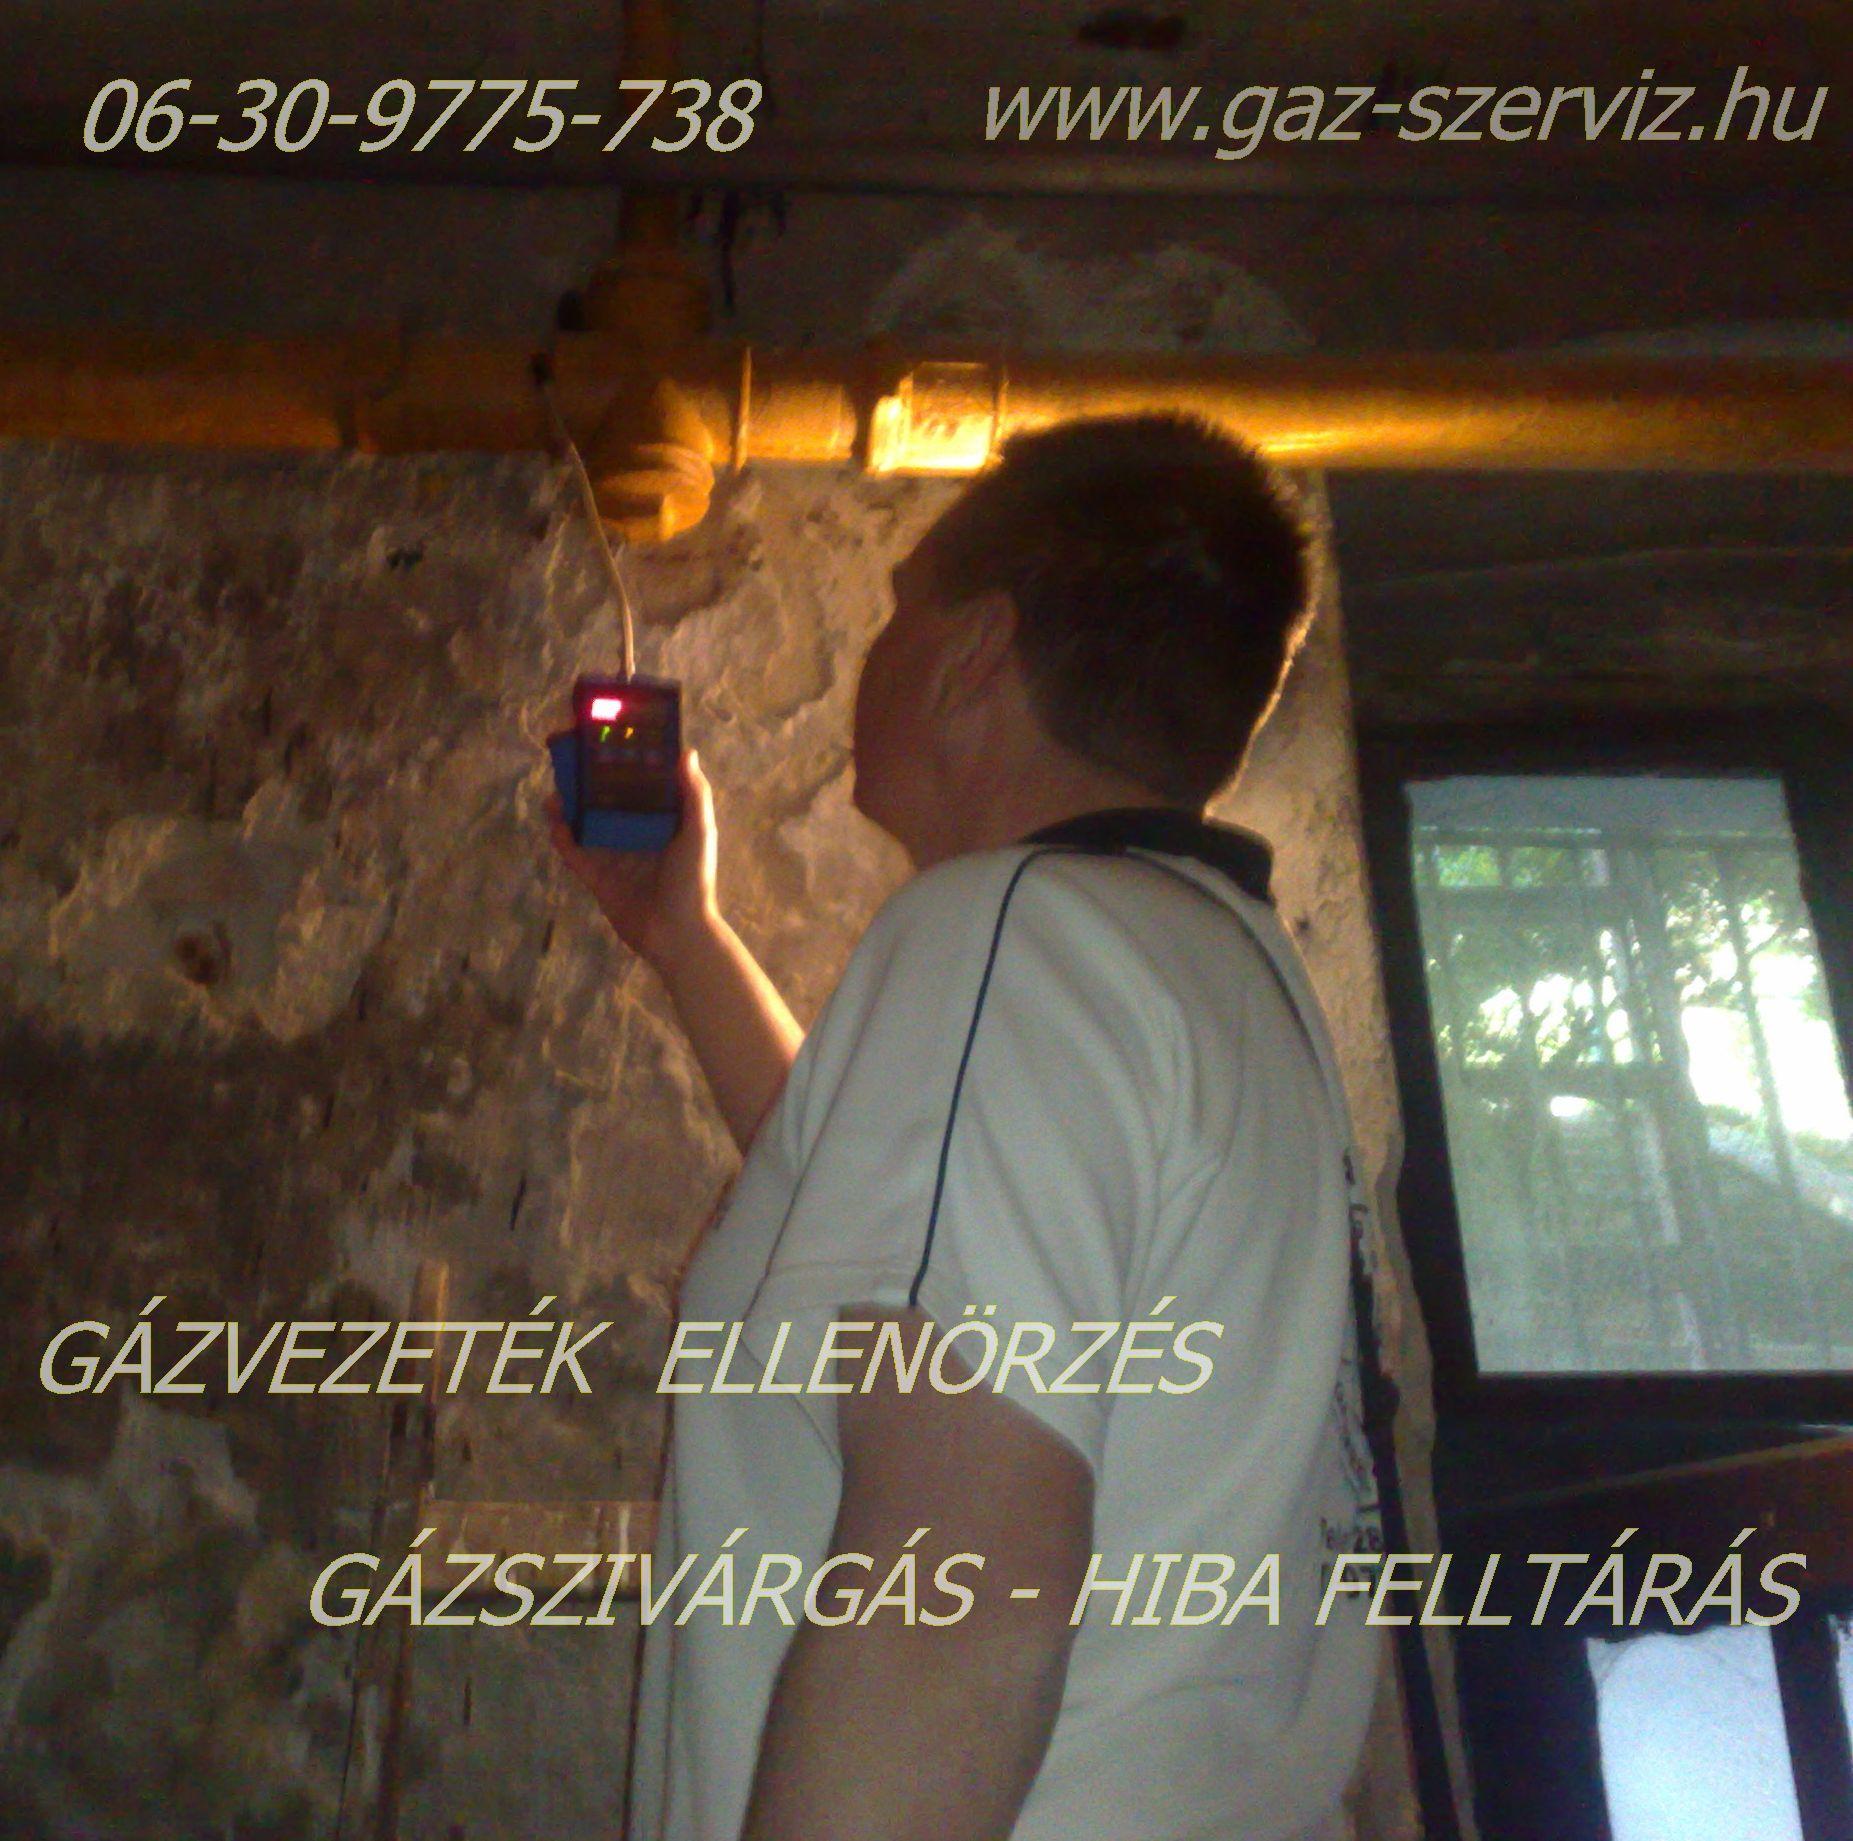 T�rsash�zi g�zszerel�s - G�zszerel�s - G�zvezet�k szerel�s - G�zvezet�k ellen�rz�s  -  G�zszag - Hiba fellt�r�s  - G�zvezet�k szerel�s  ( 06-30 ) 9775-738